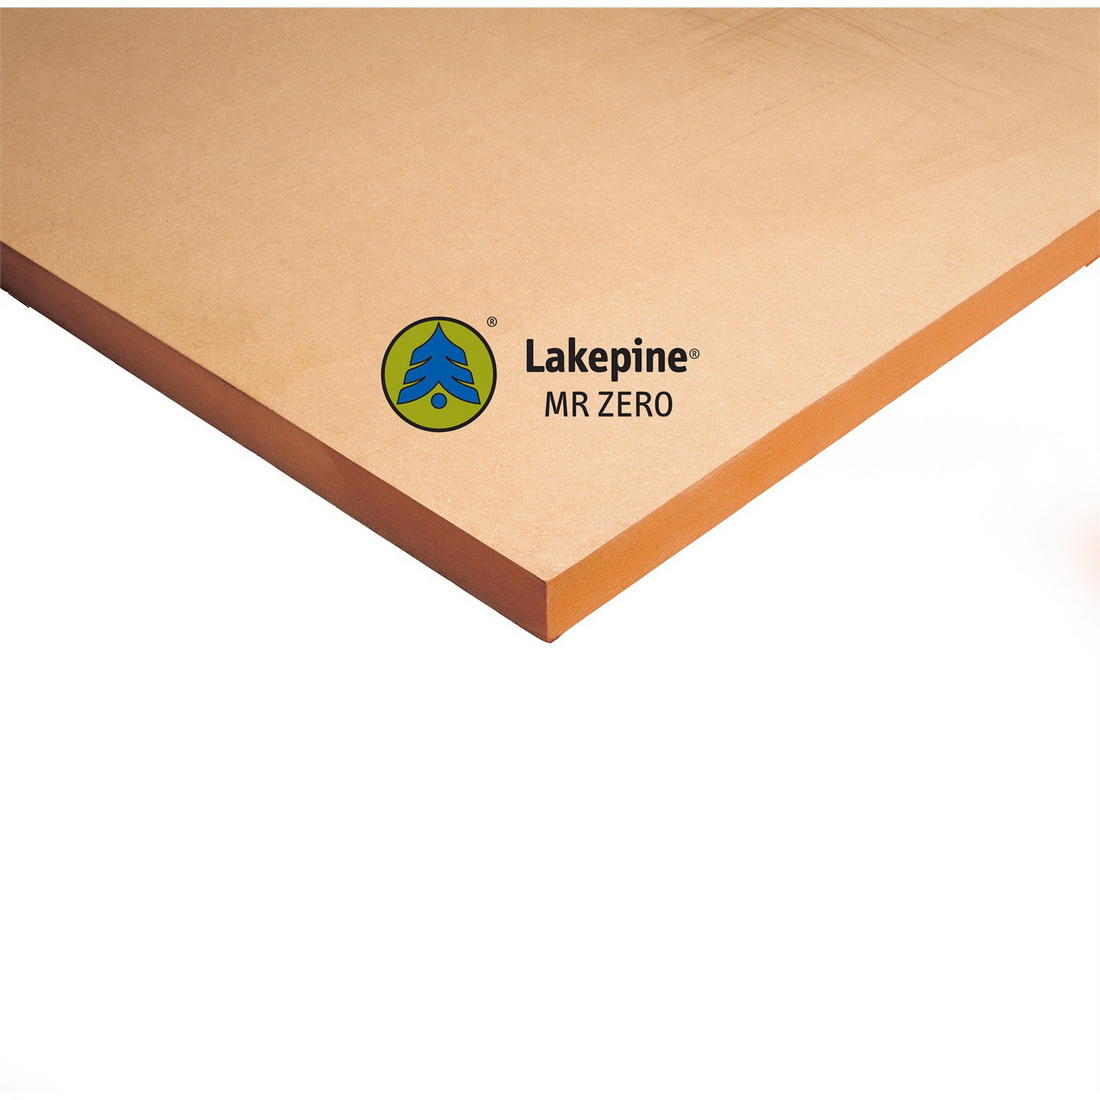 Lakepine Thin Standard MDF Panel 2440 x 1220 x 3 mm 8601148